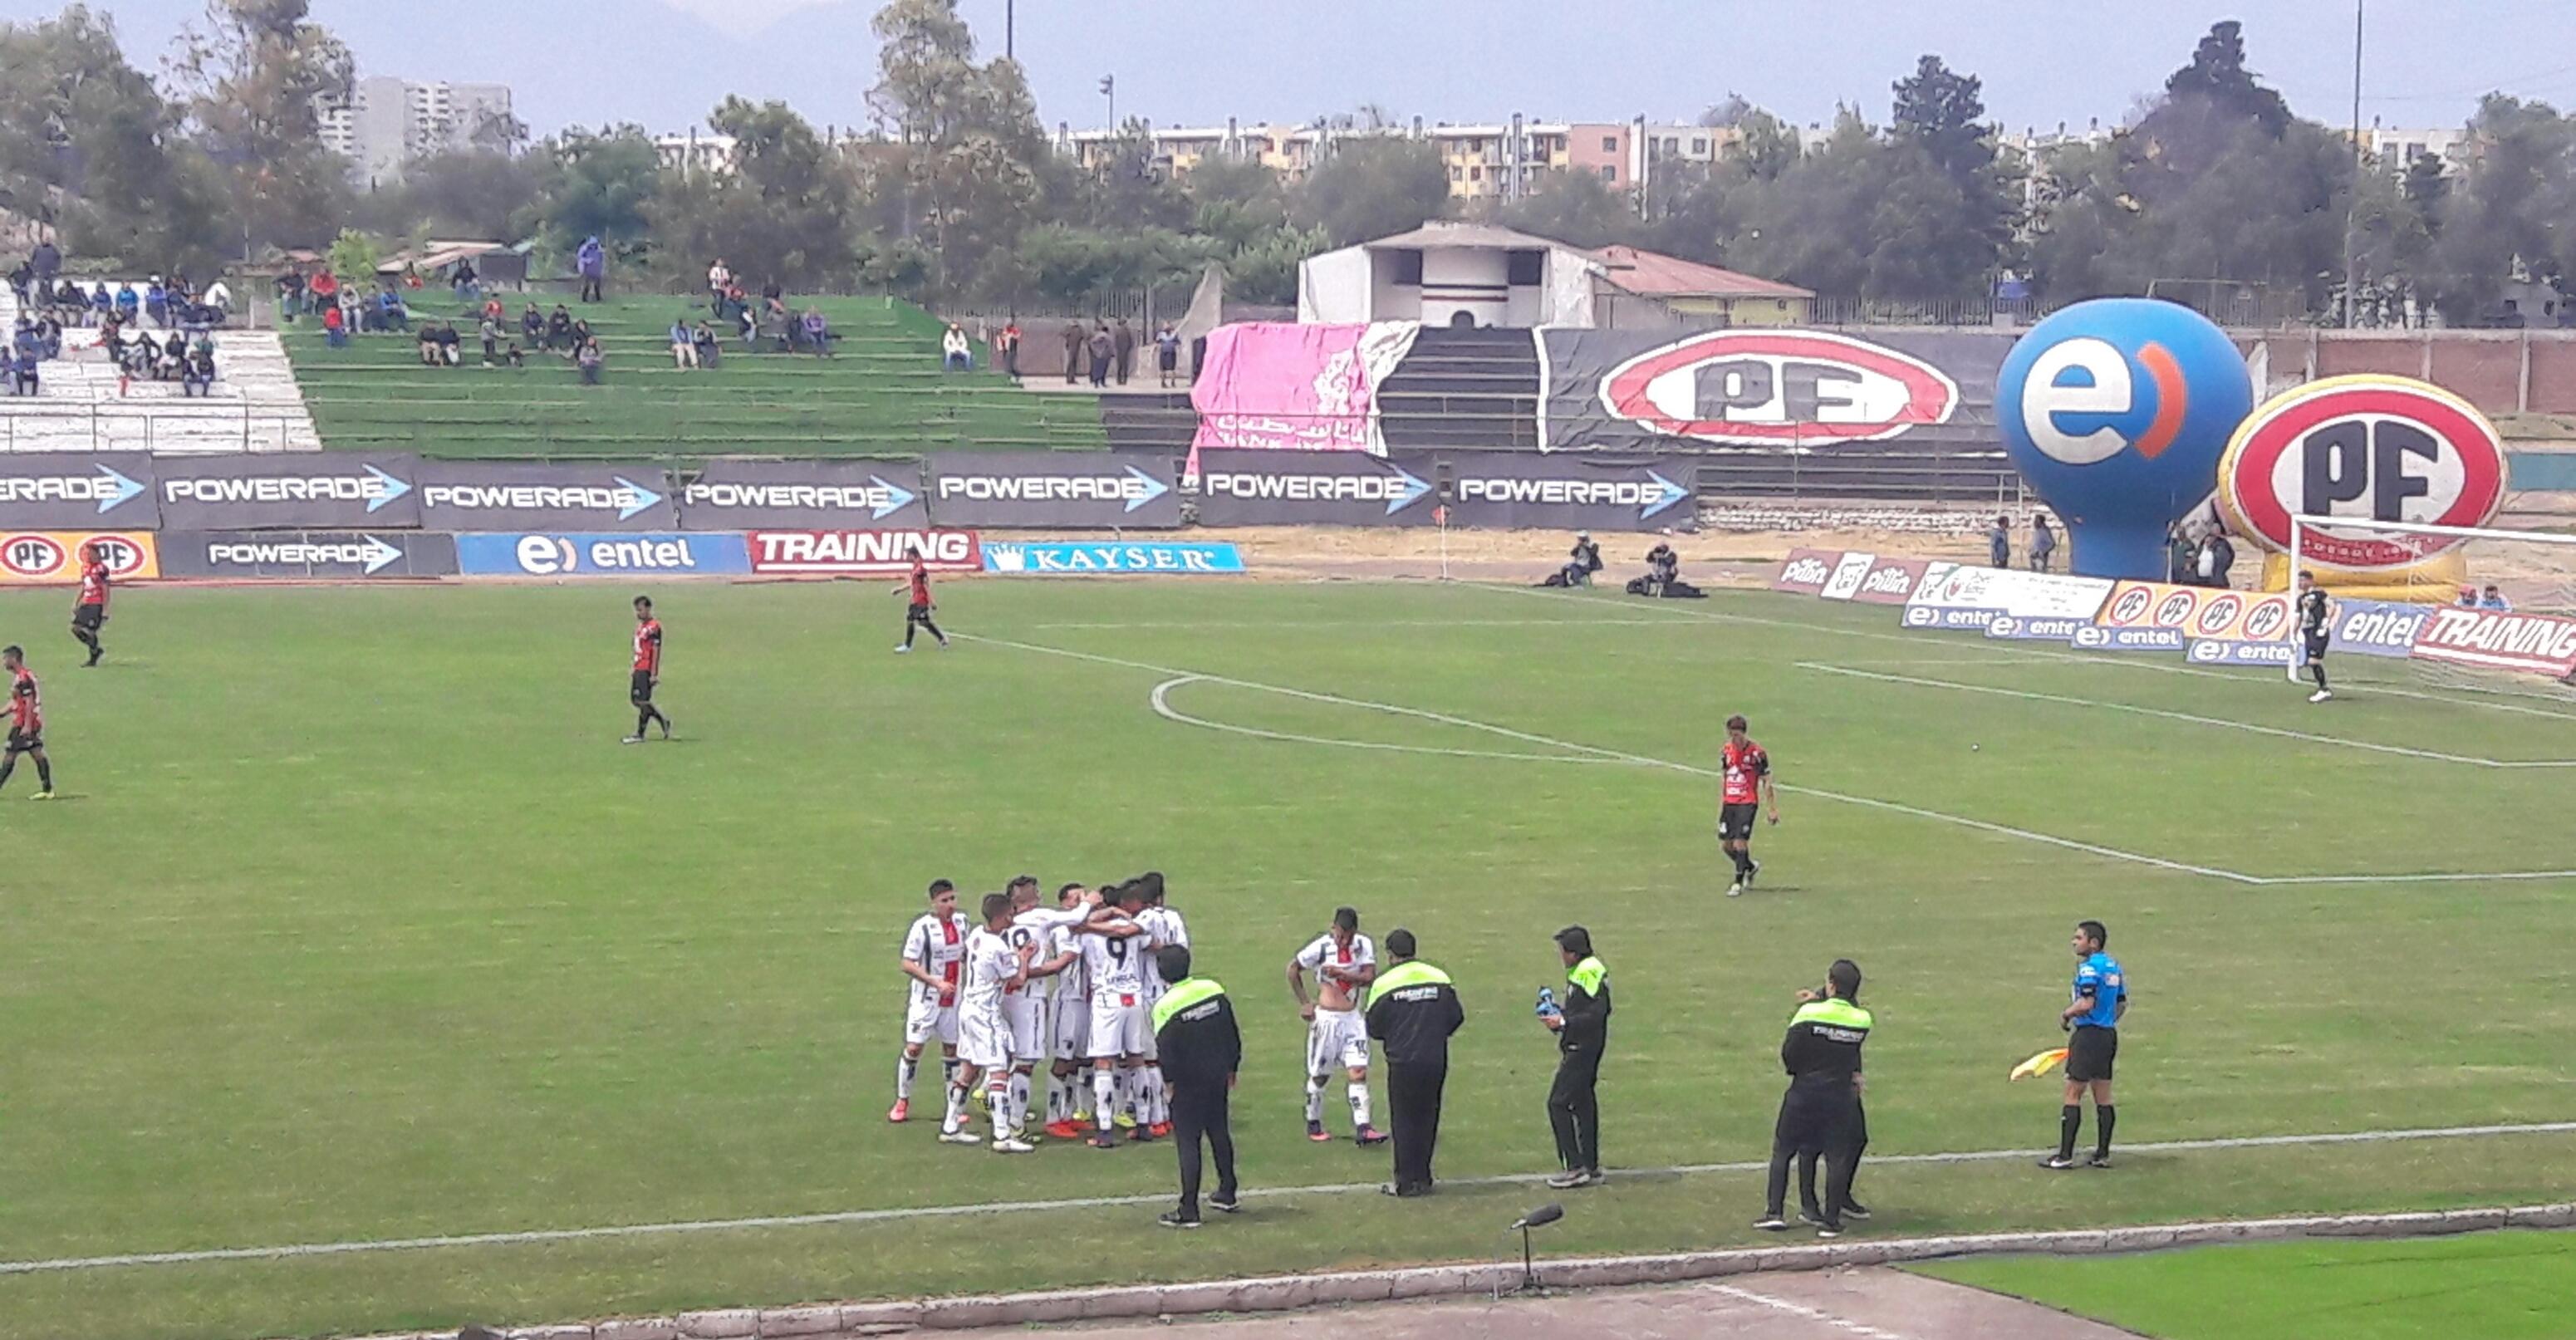 Palestino aplastó a Deportes Antofagasta con un inspirado Leandro Benegas